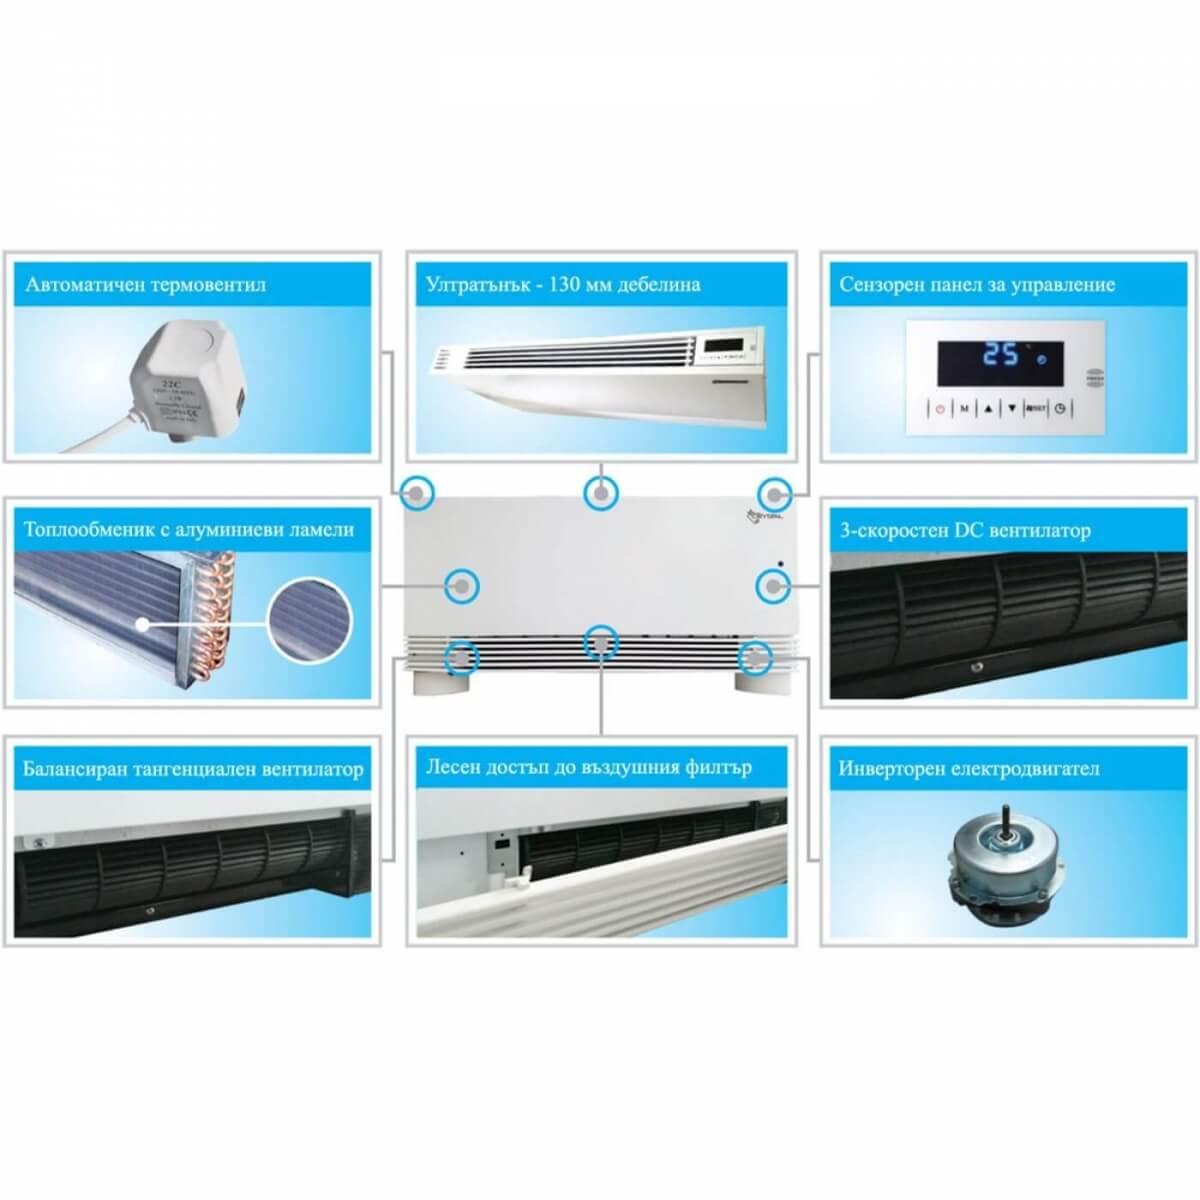 Вентилаторен конвектор Crystal BGR-600 L/R - 2